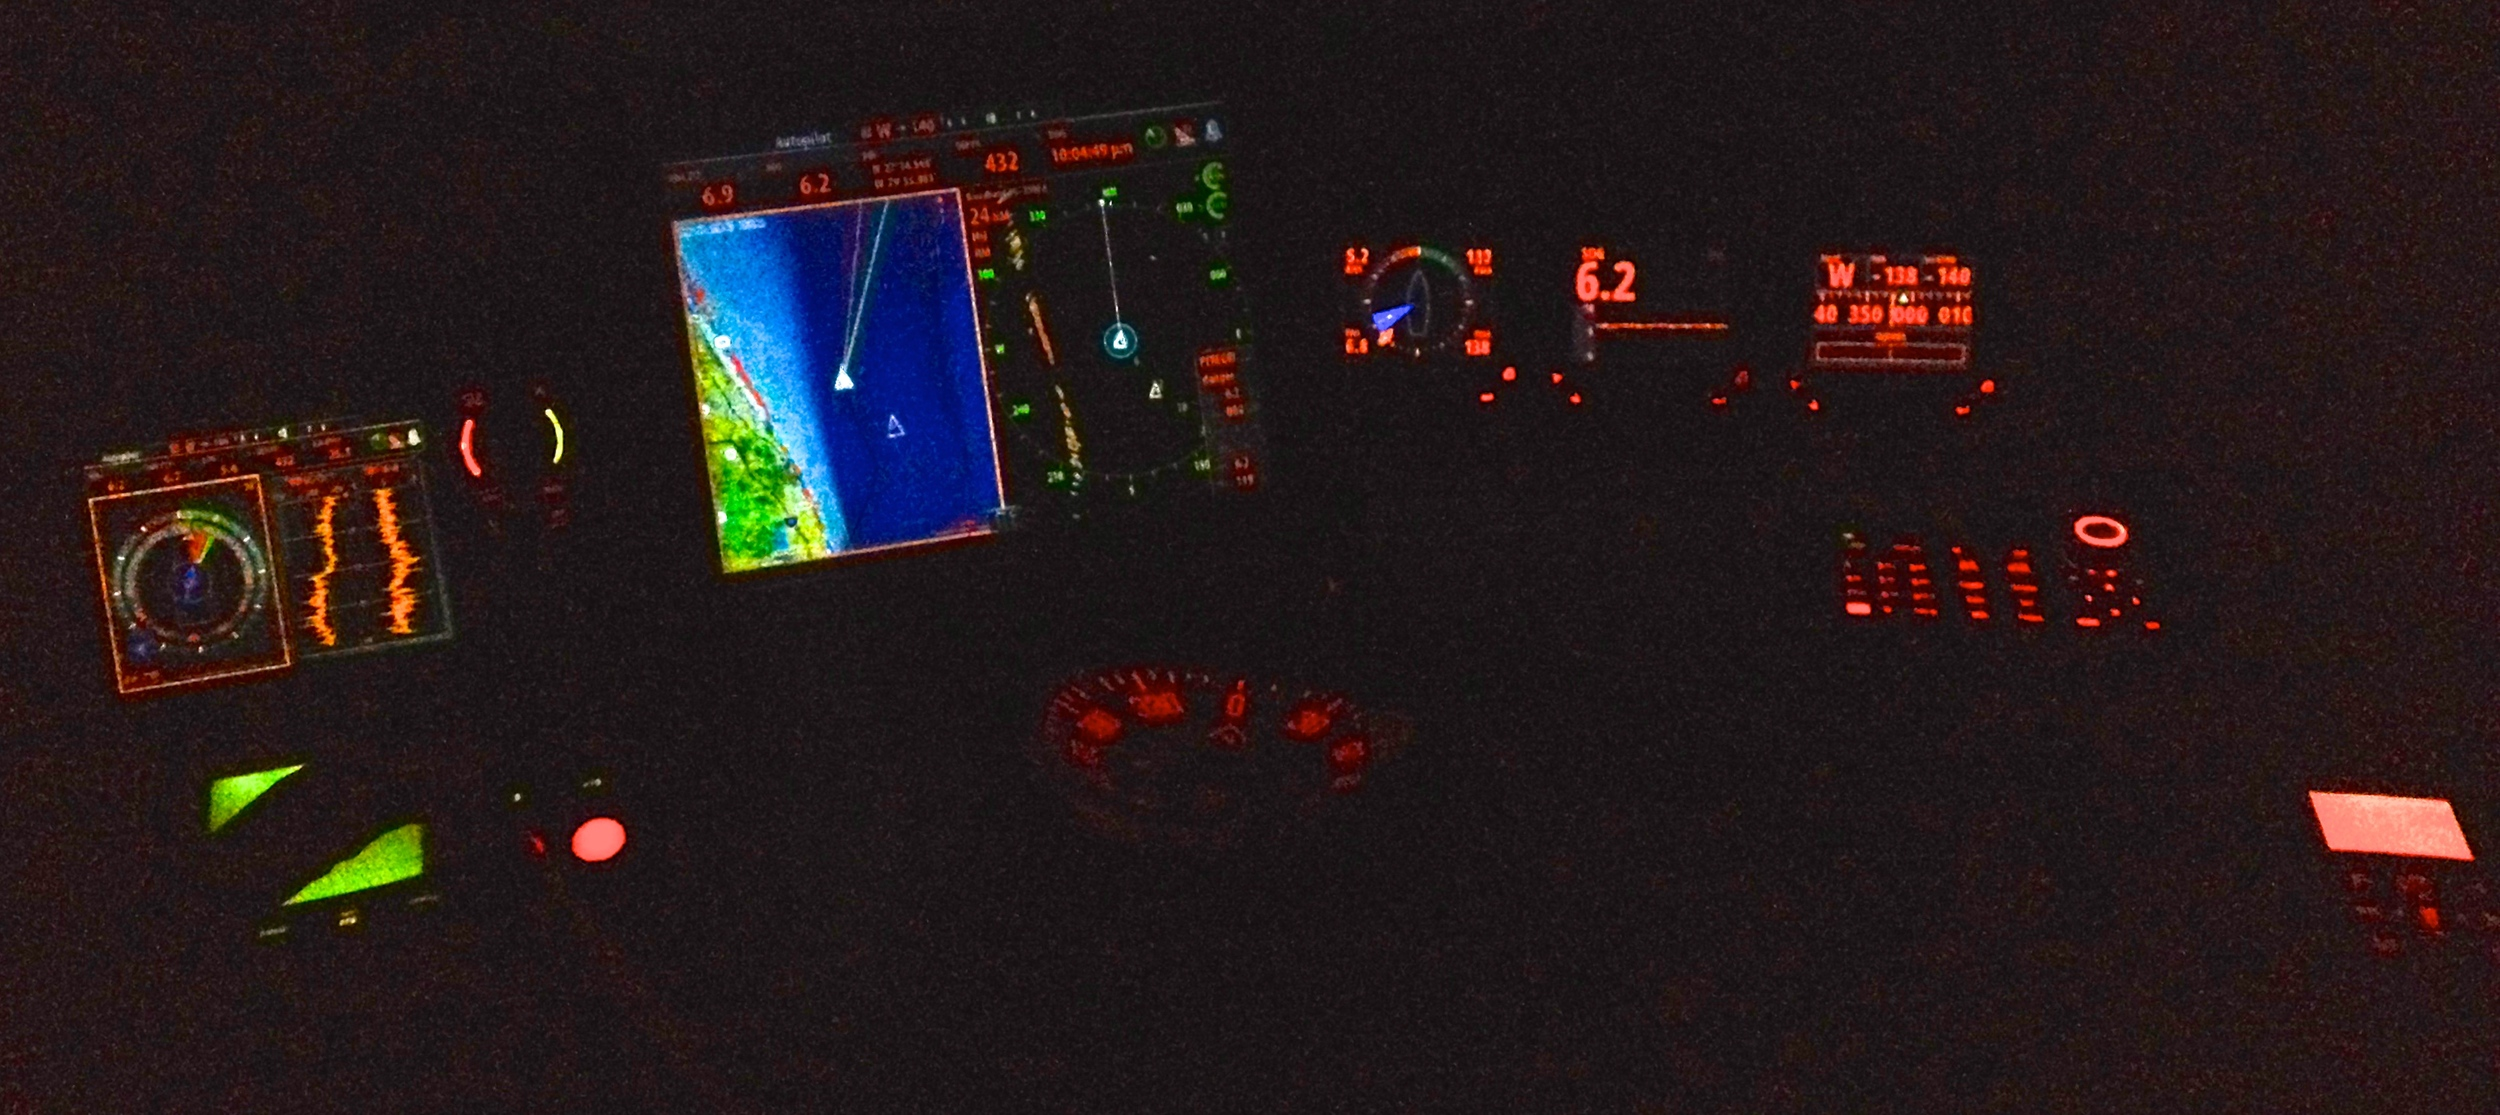 Peregrinus offshore on the Gulf stream, 10:05 pm 9 Jun 2014. iPhone 4.